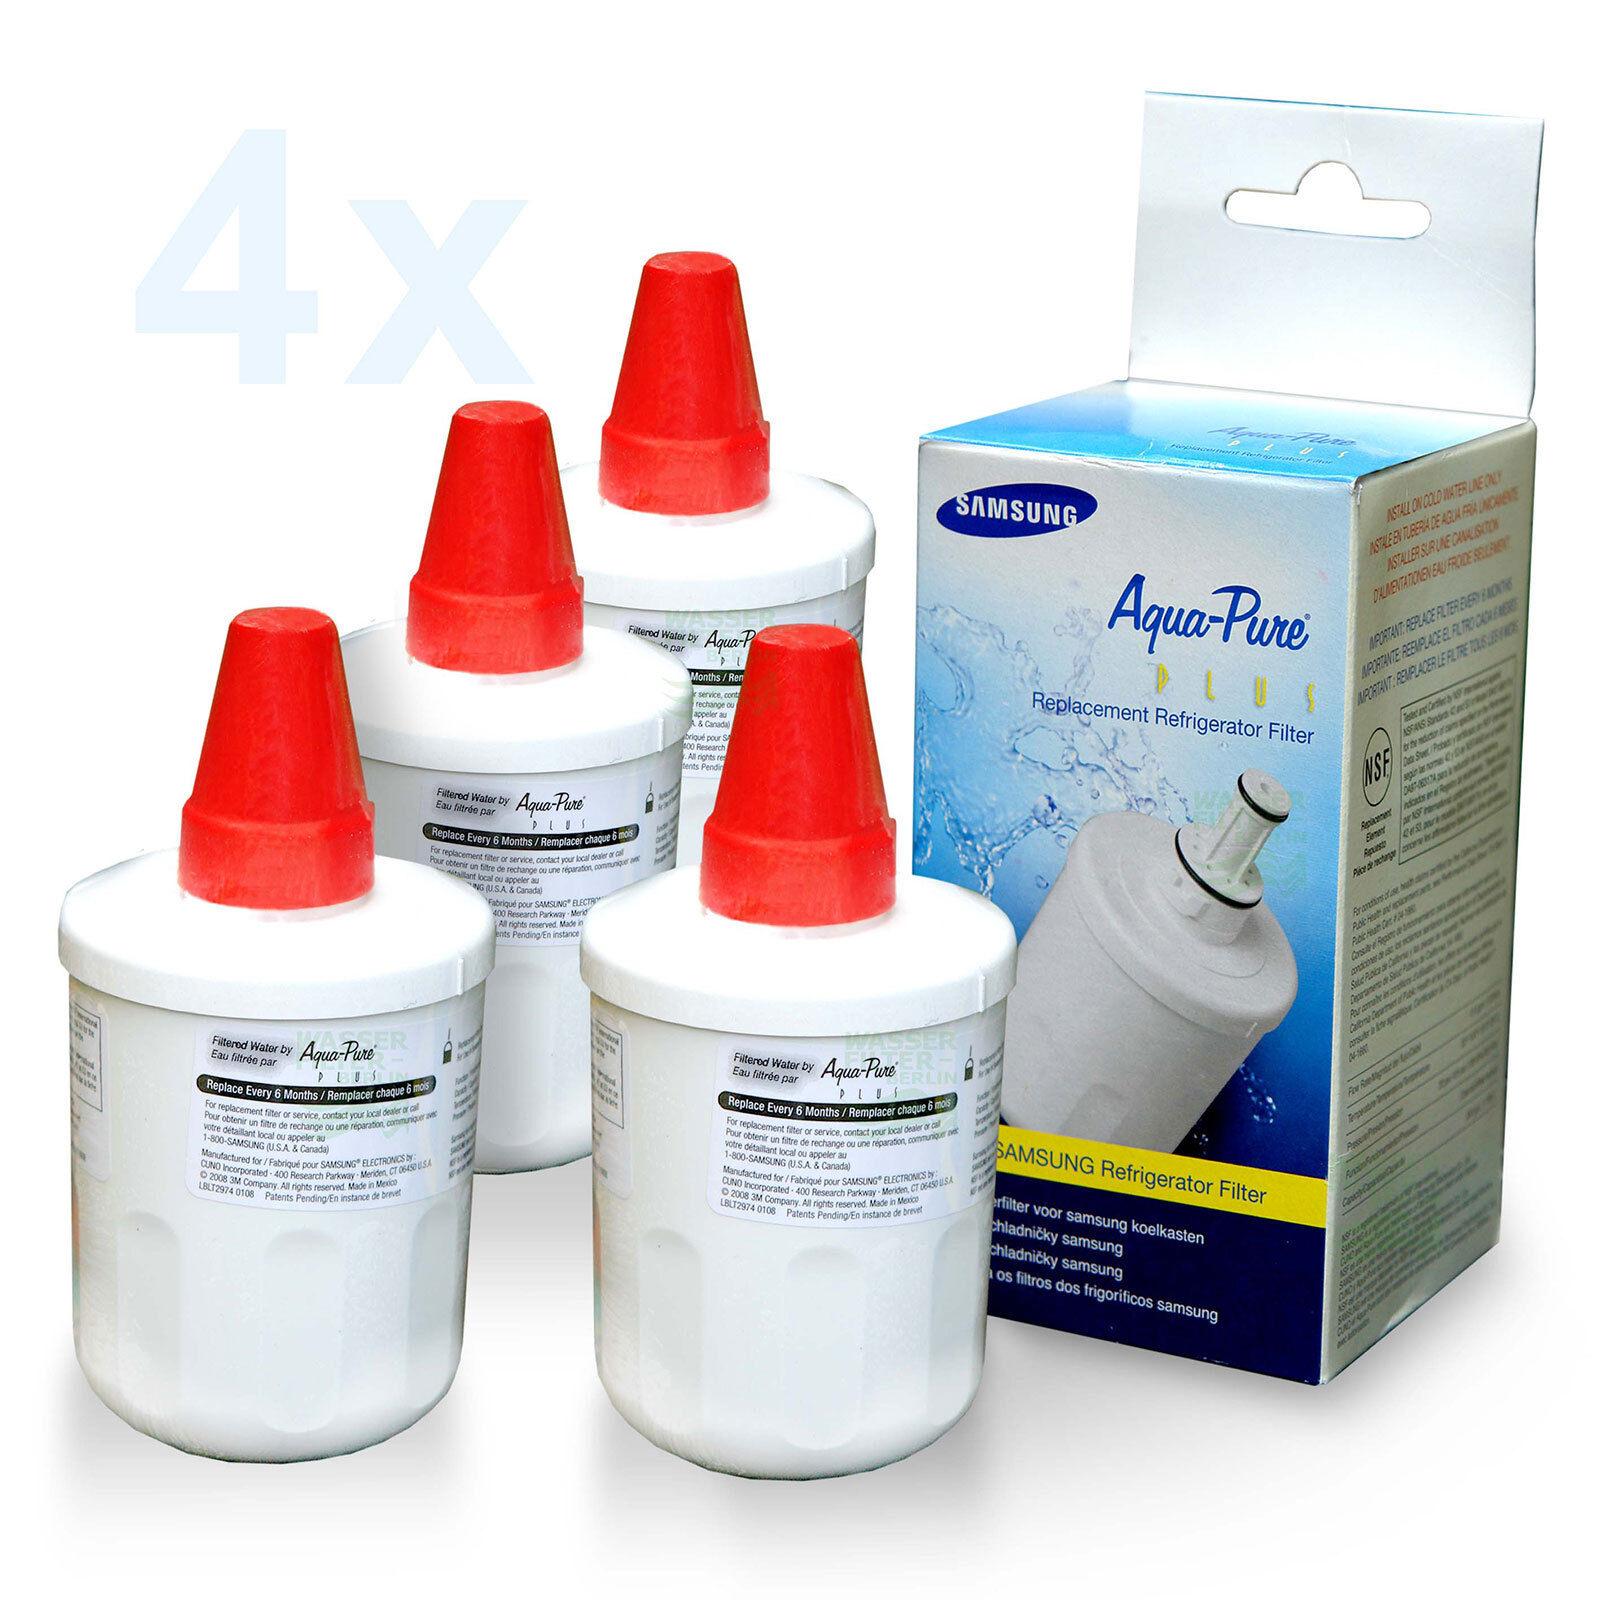 4 x SAMSUNG Aqua-Pure Réfrigérateur Filtre da29-00003g Filtre à Eau Réfrigérateur (12